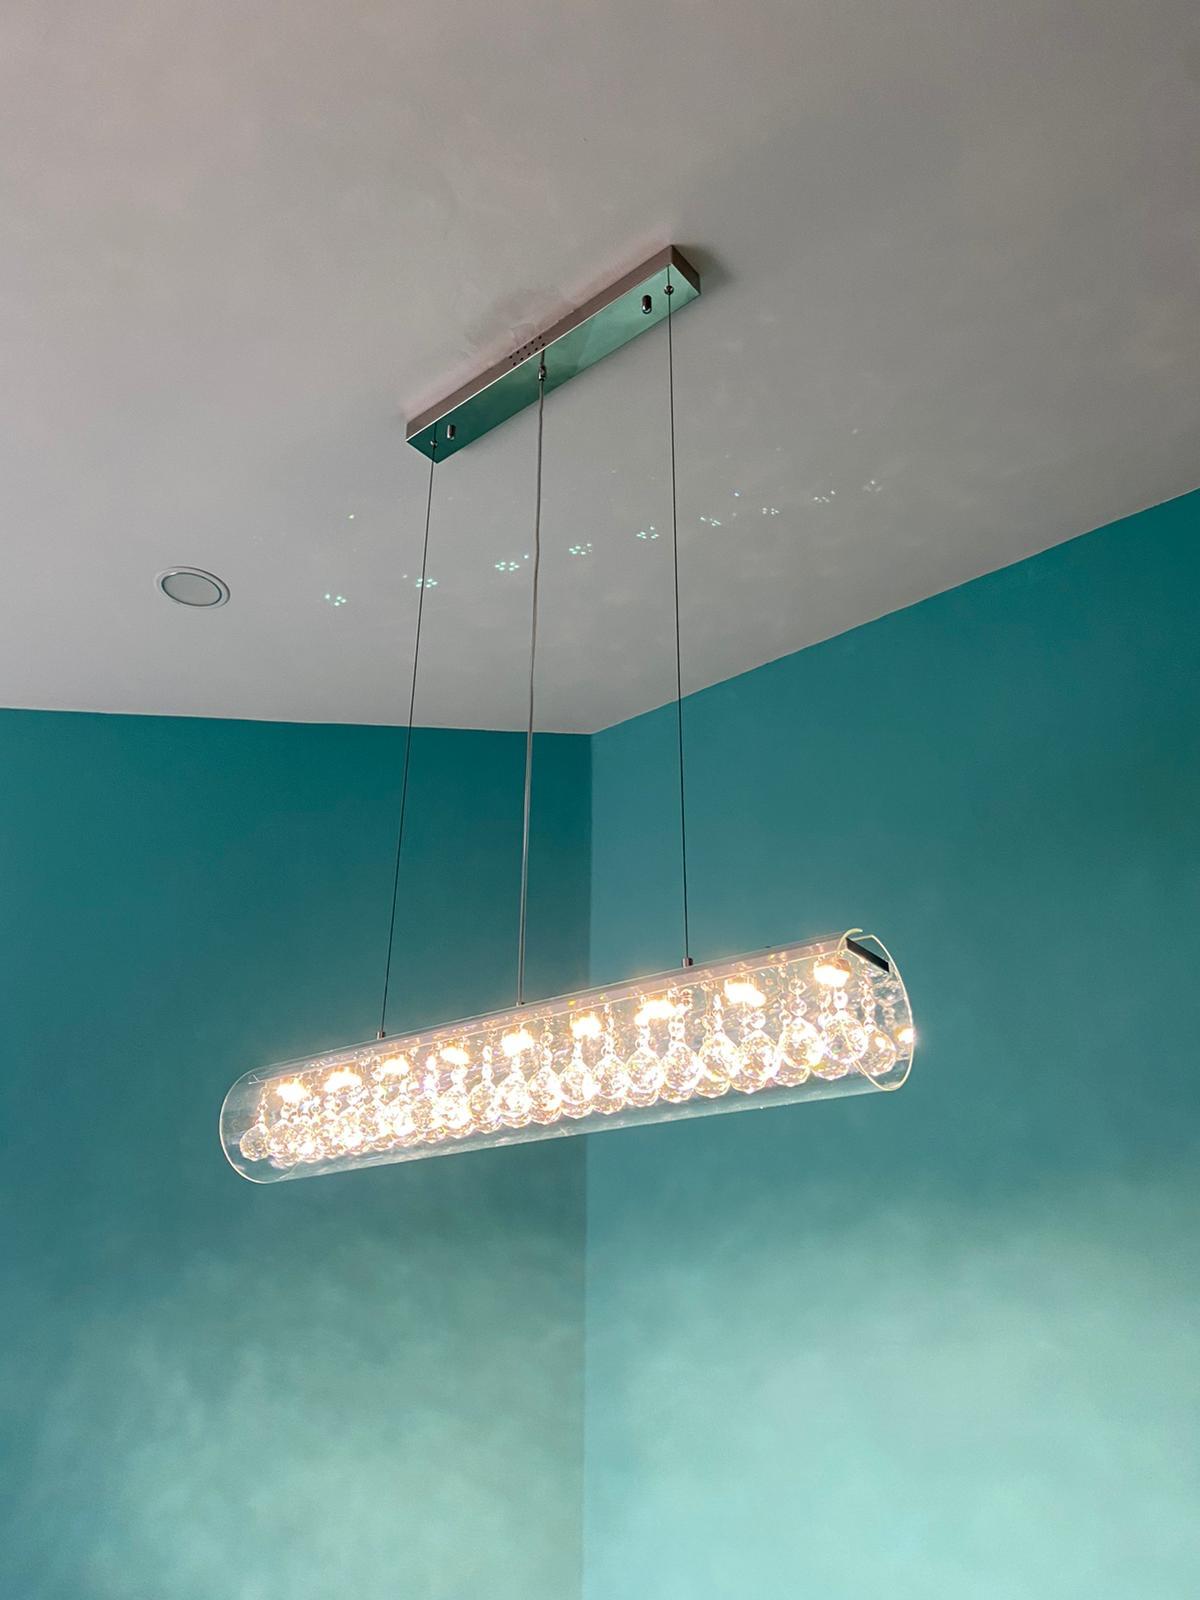 9000-90-long-crystal-chandelier-2-sembawang-lighting-house.jpg